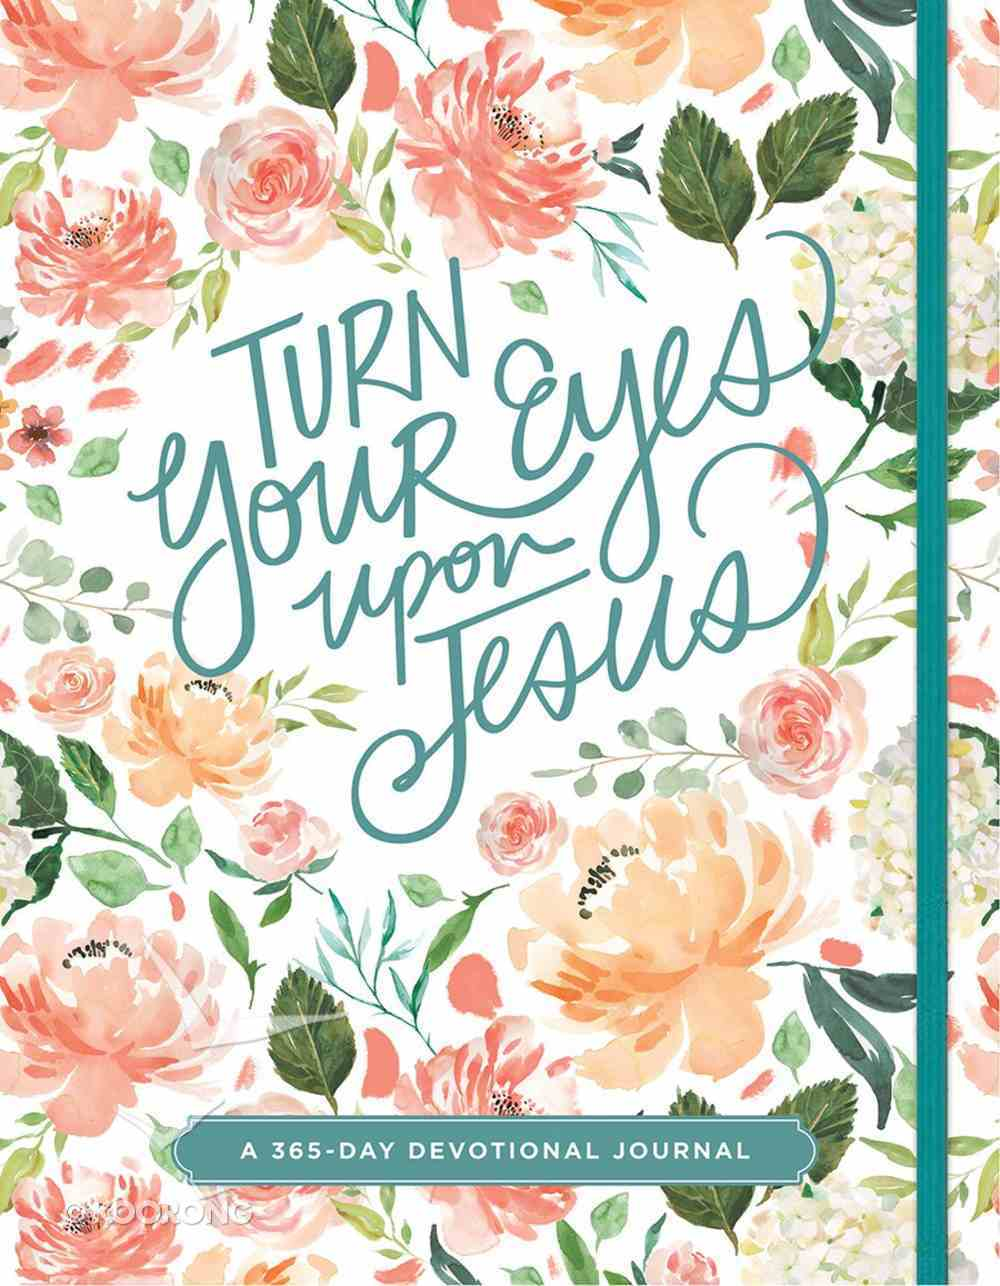 Devotional Journal: Turn Your Eyes Upon Jesus Paperback